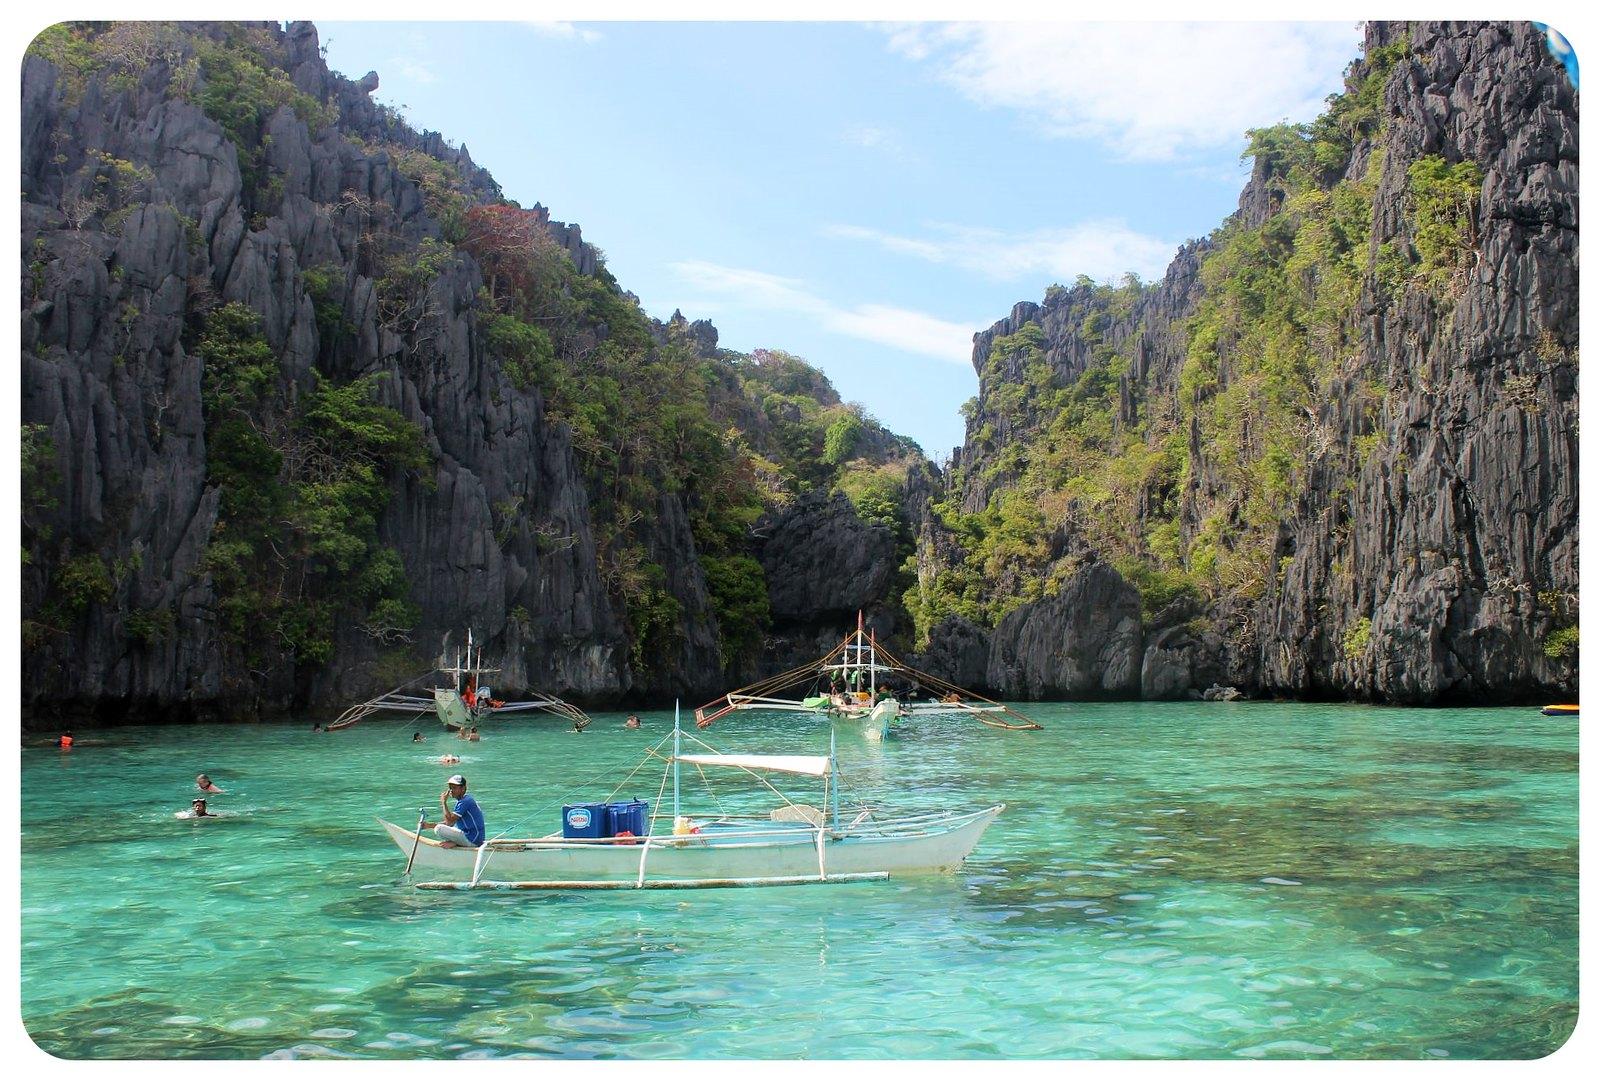 bacuit archipelago lagoon